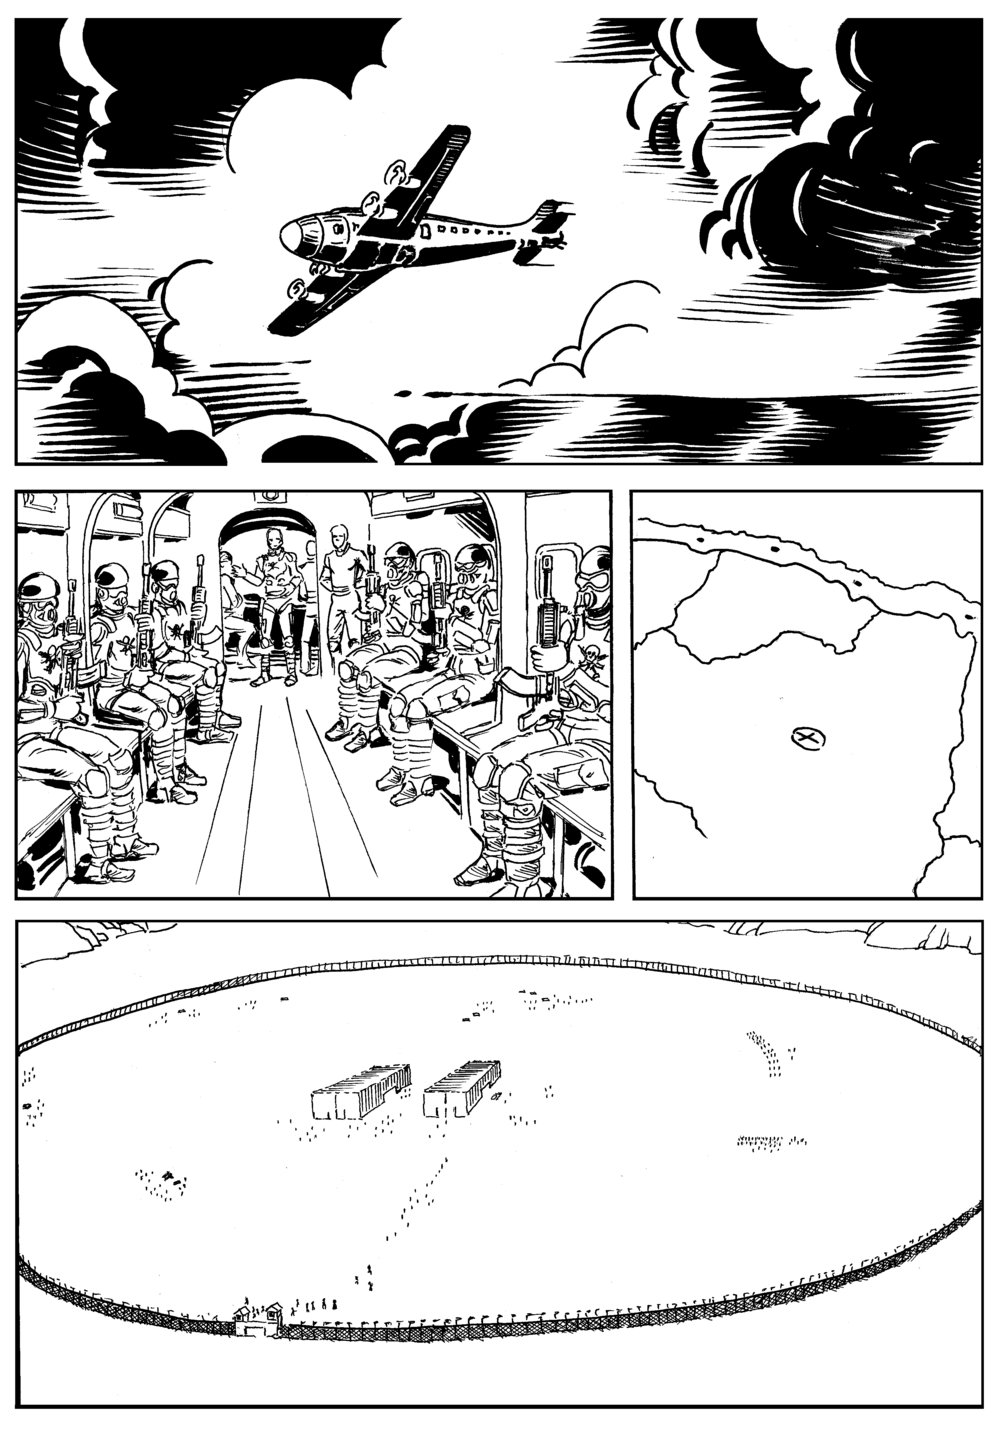 Hendrik The Torpedo - Ricochet Squad Chapter 1 - Art by AC Rillo